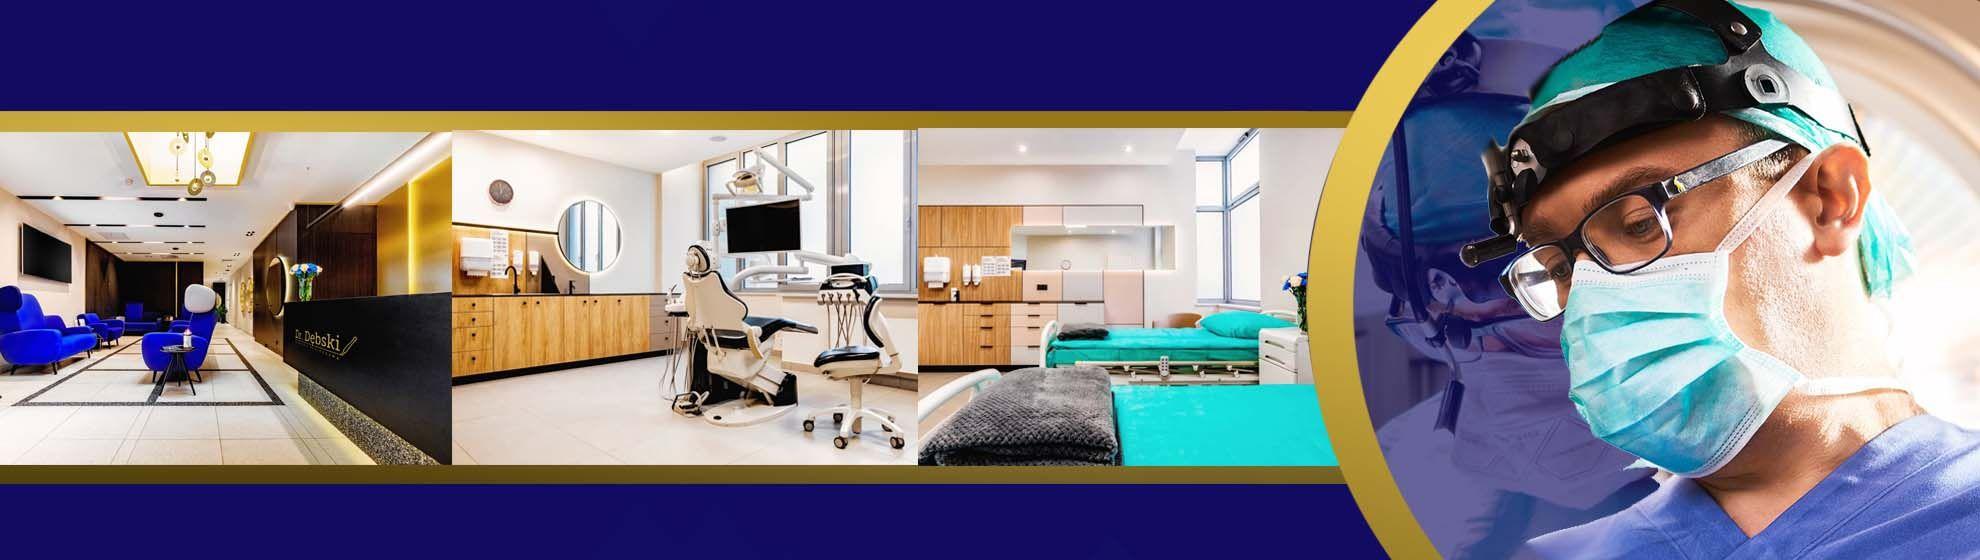 Klinika DR DĘBSKI